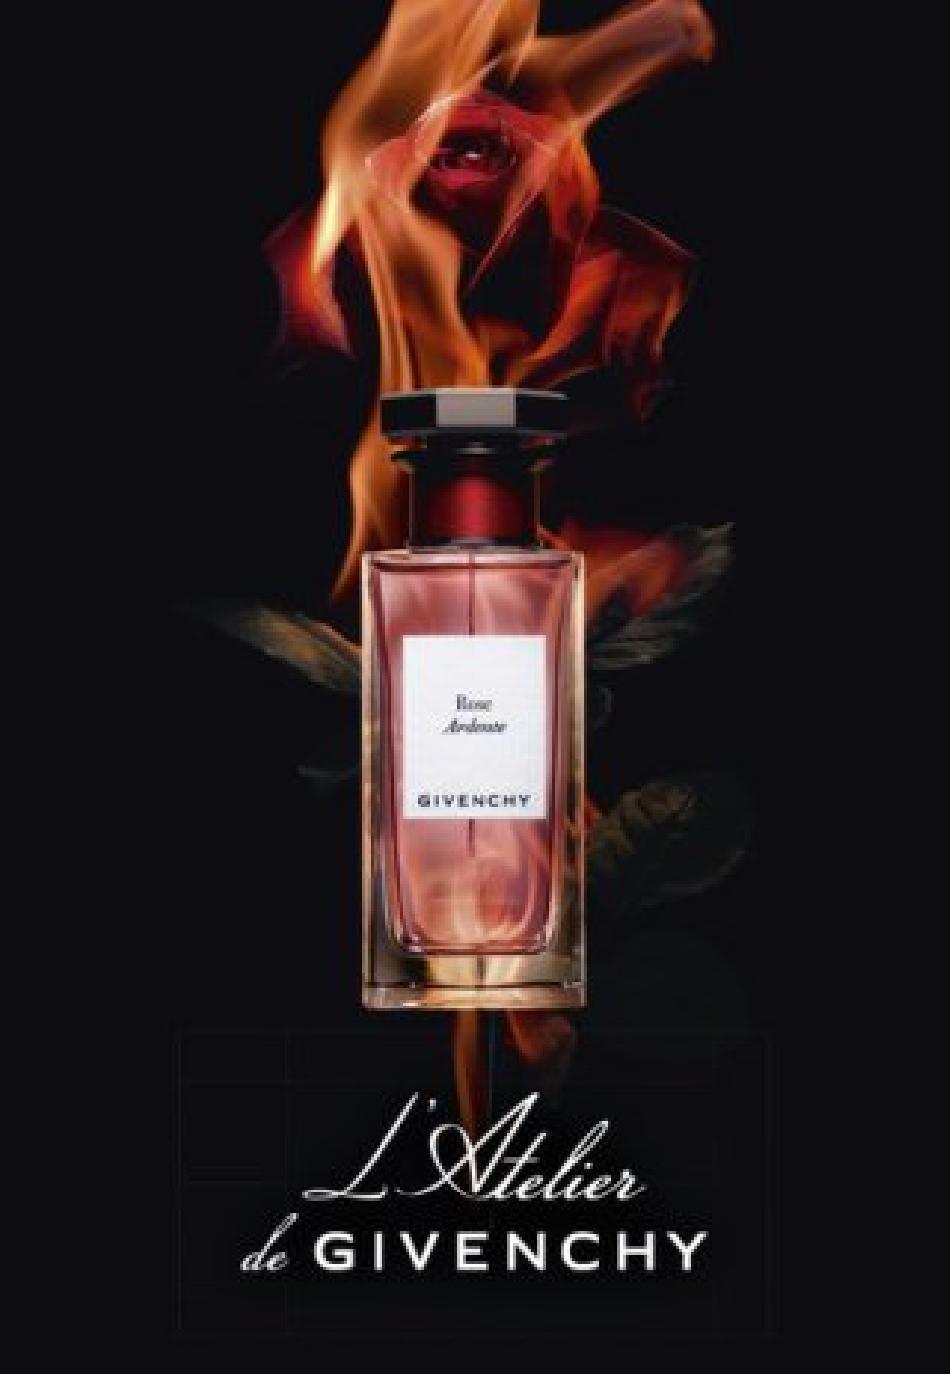 Givenchy Rose L'atelier De Ardente wTPXZOiku